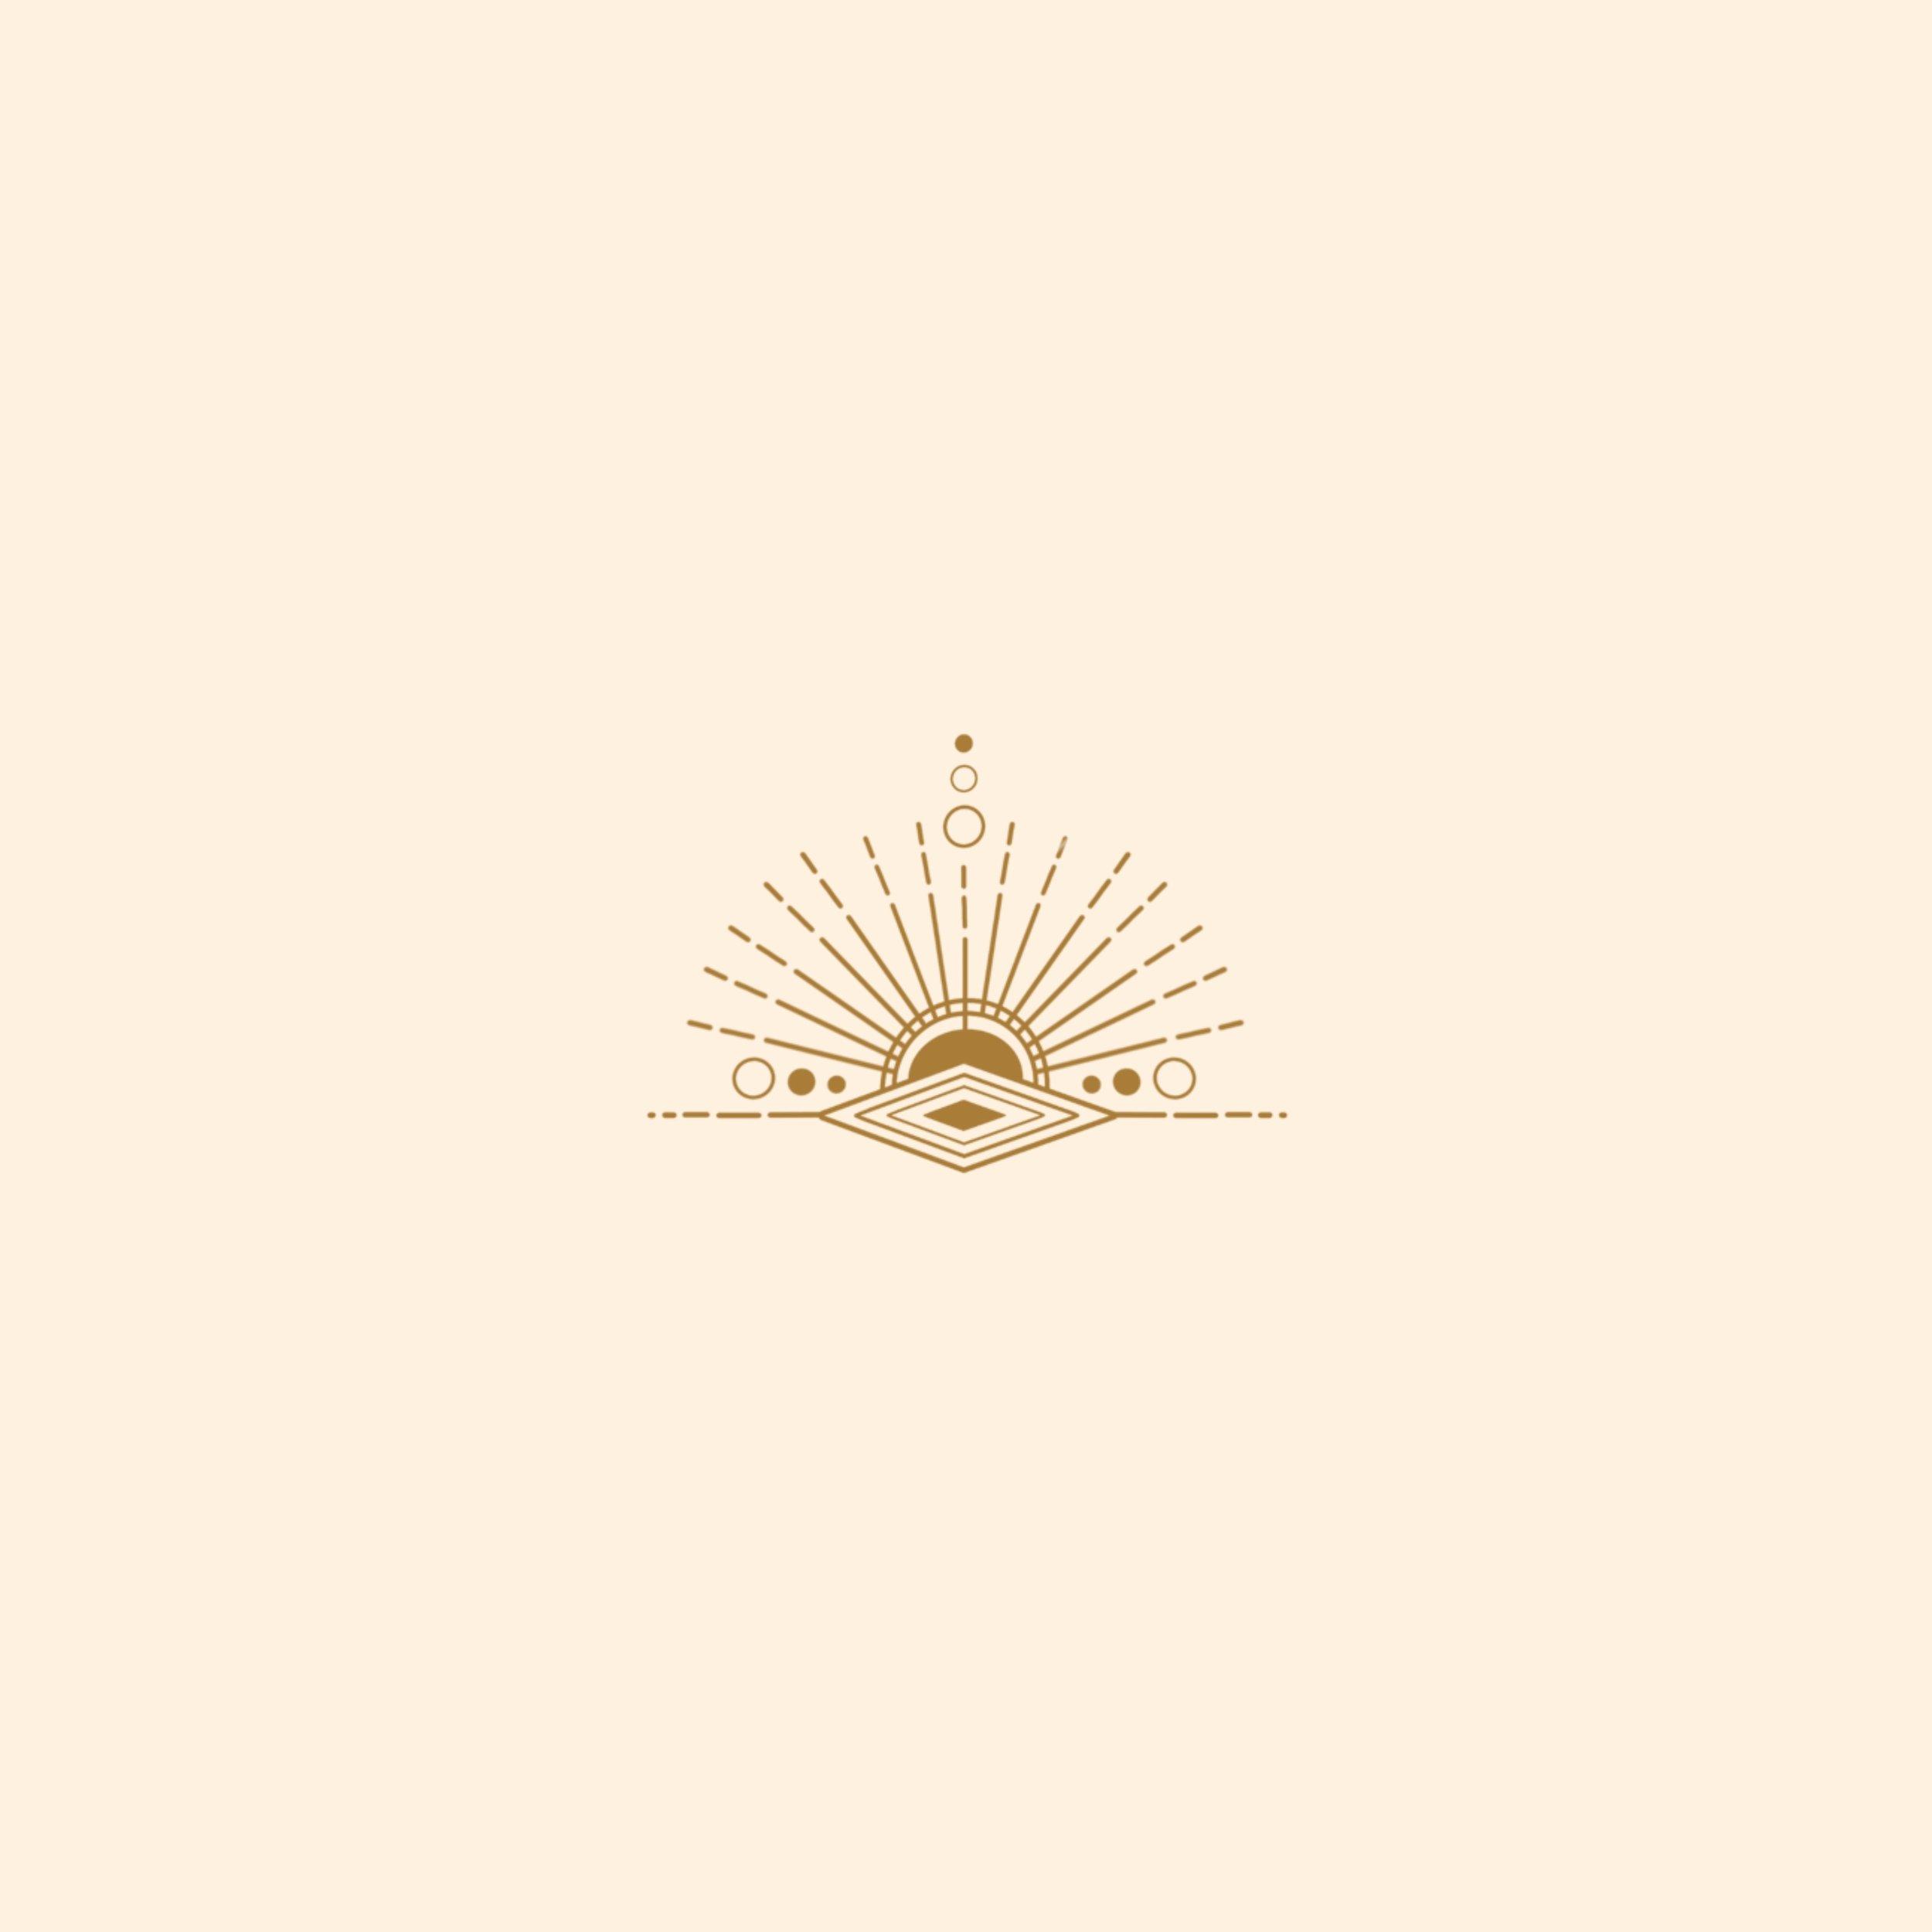 sunbursts logo branding icon